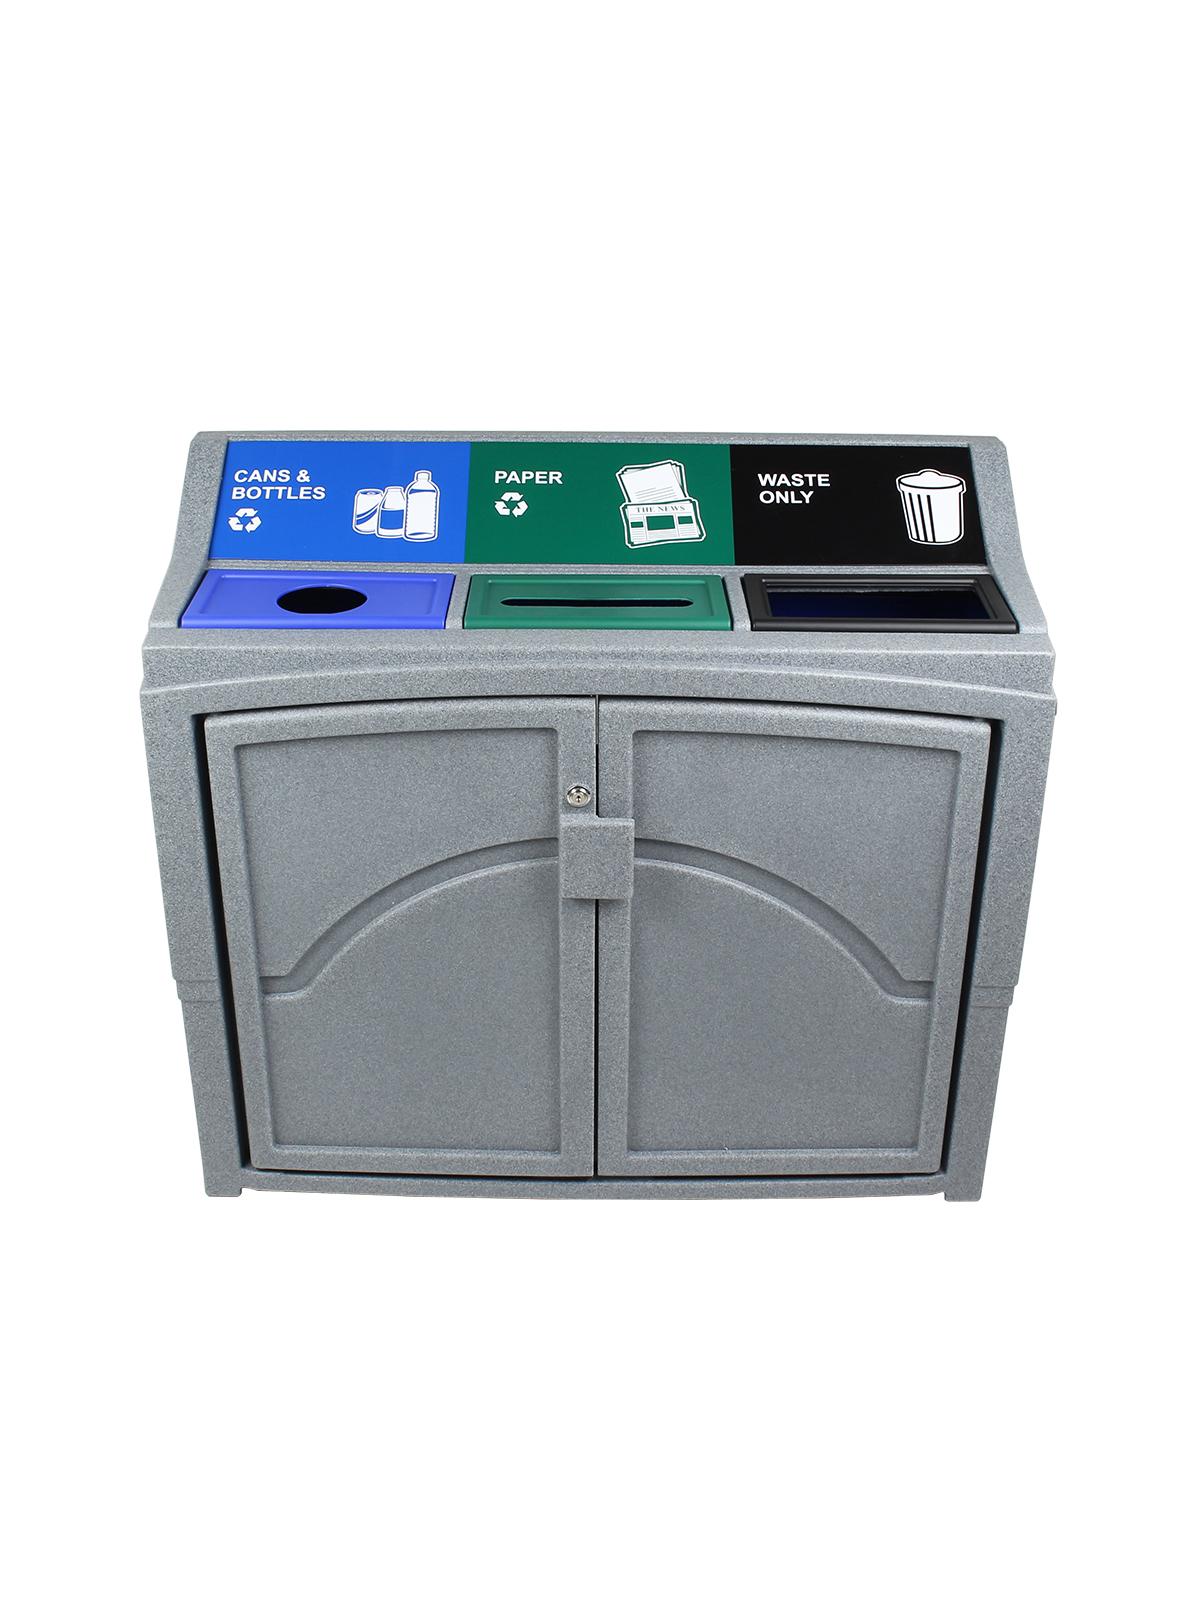 PAVILION - Triple - Cans & Bottles-Paper-Waste - Circle-Slot-Full - Greystone